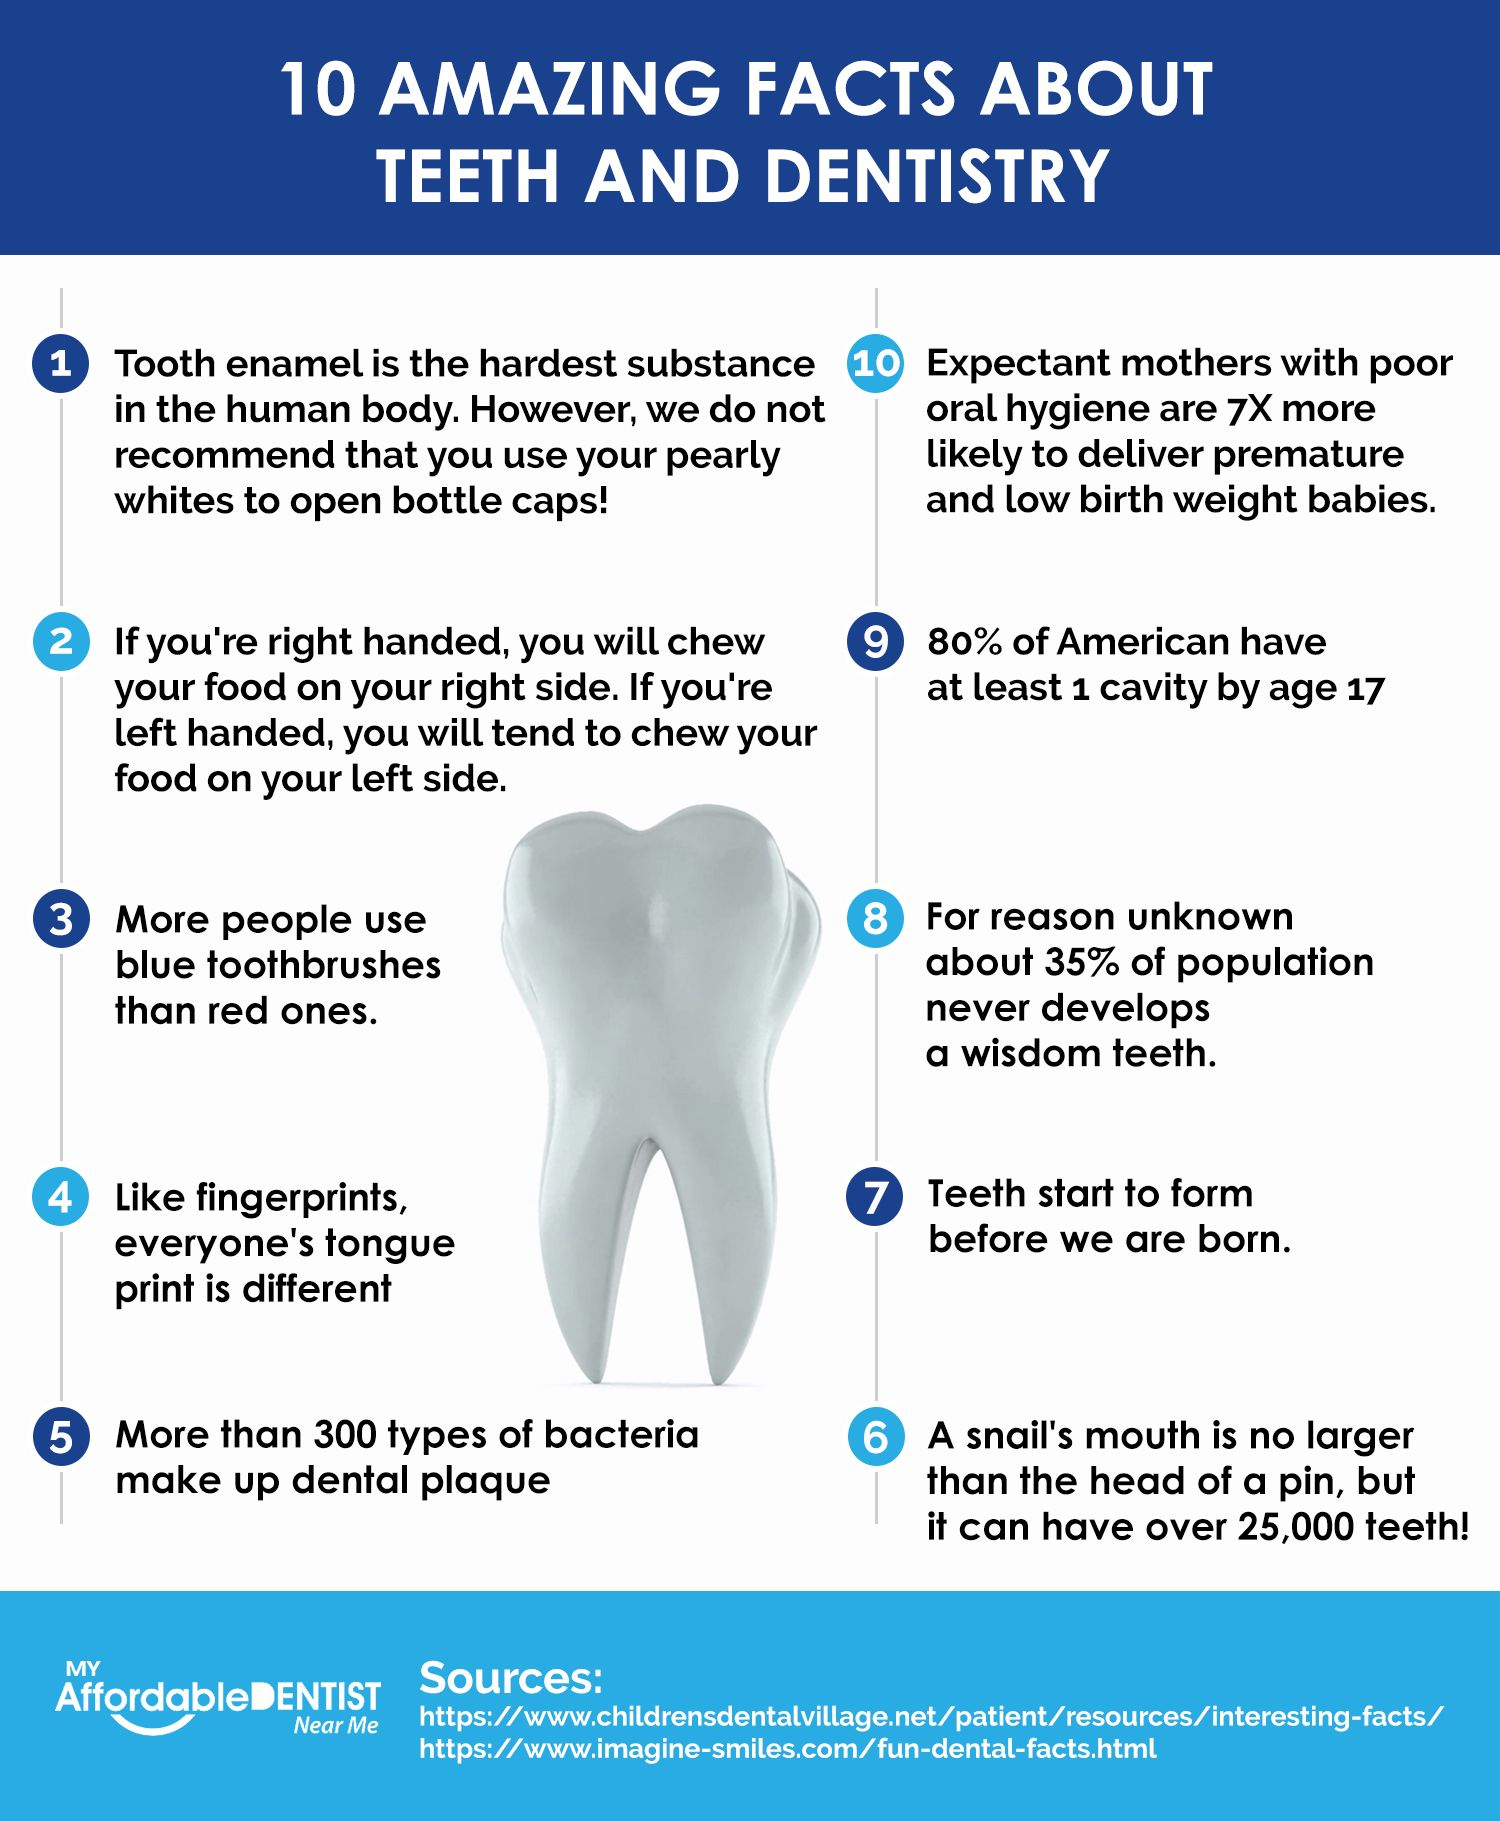 Affordable Dental Near Me offers quality dental service